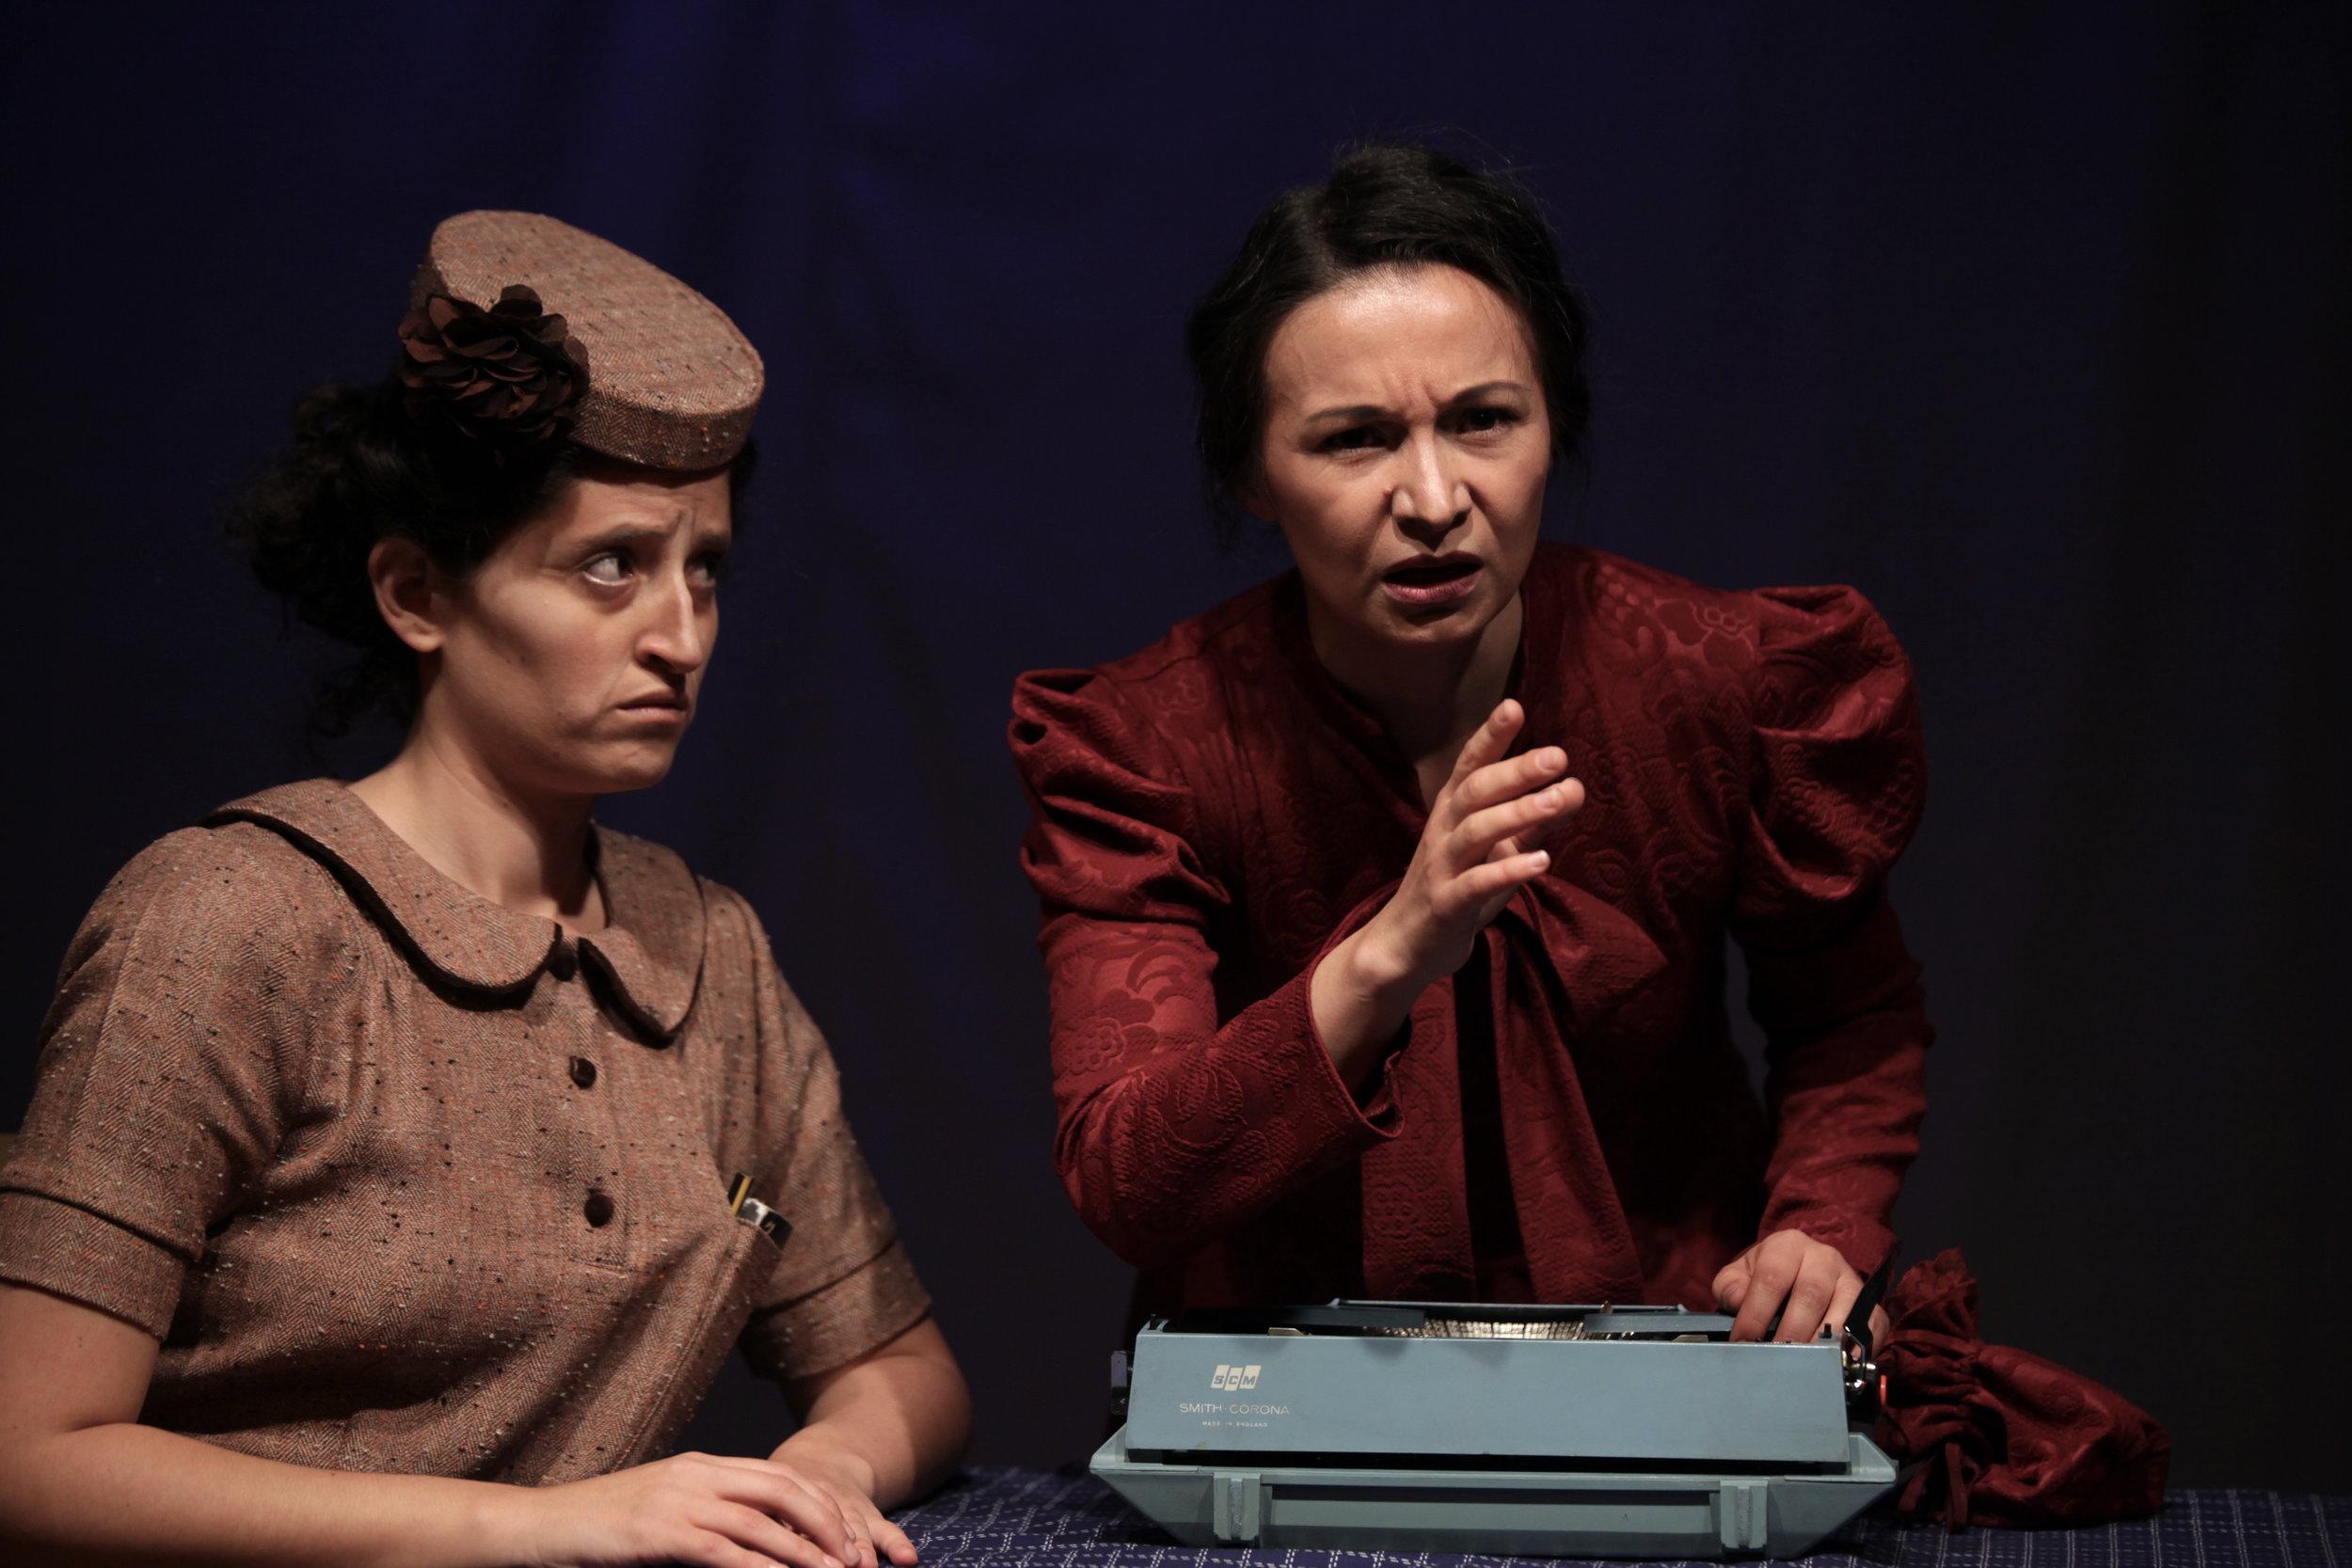 Virginia Woolf: Salomé Velasco / Agatha Christie: Fernanda Corral